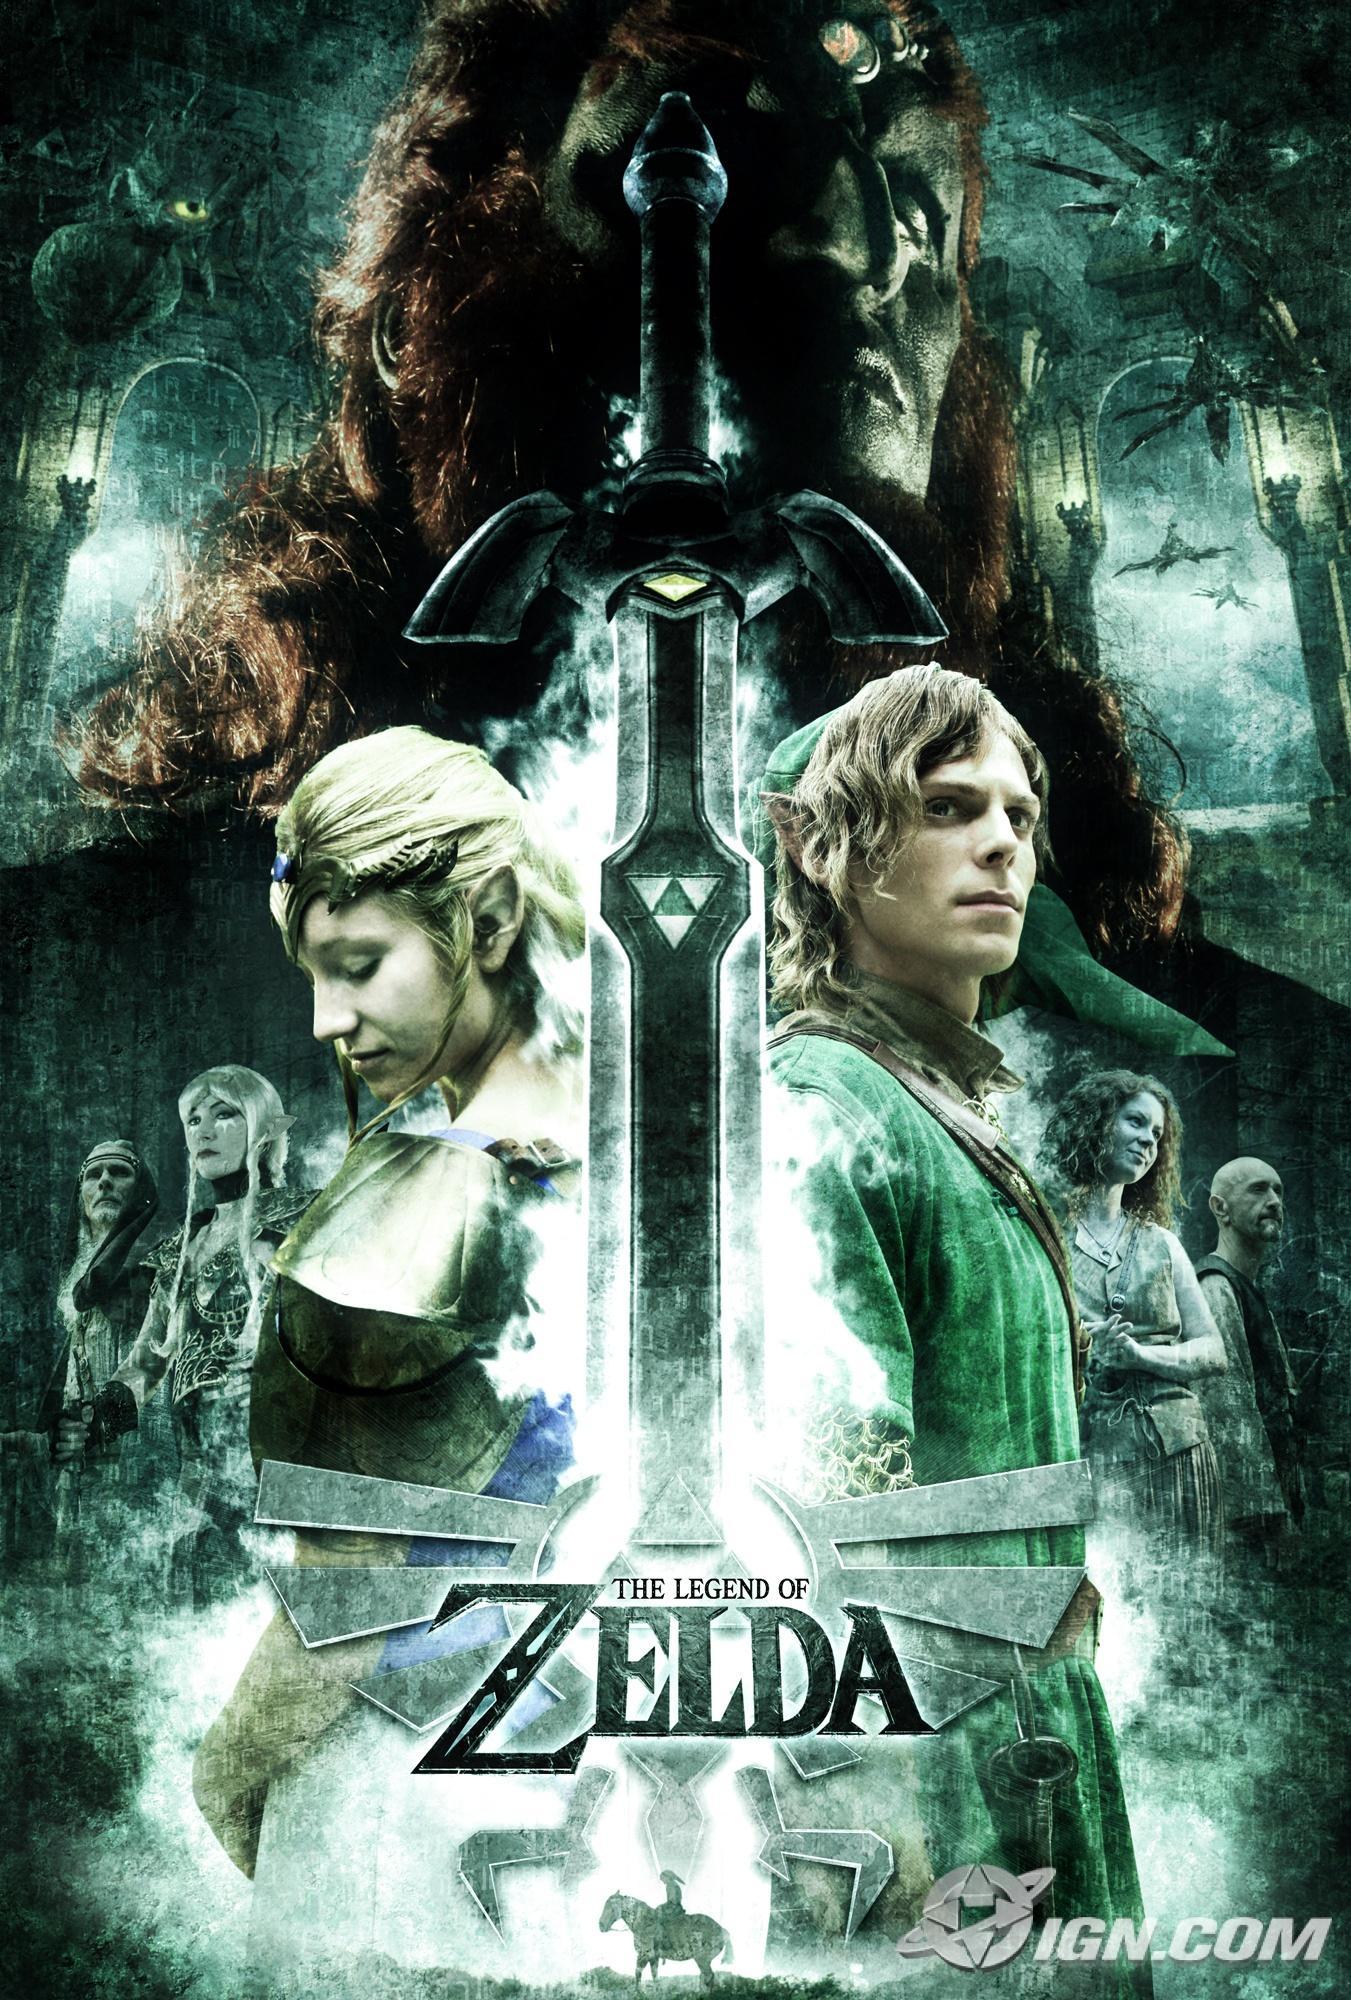 The Legend of Zelda (film) | Idea Wiki | FANDOM powered by Wikia